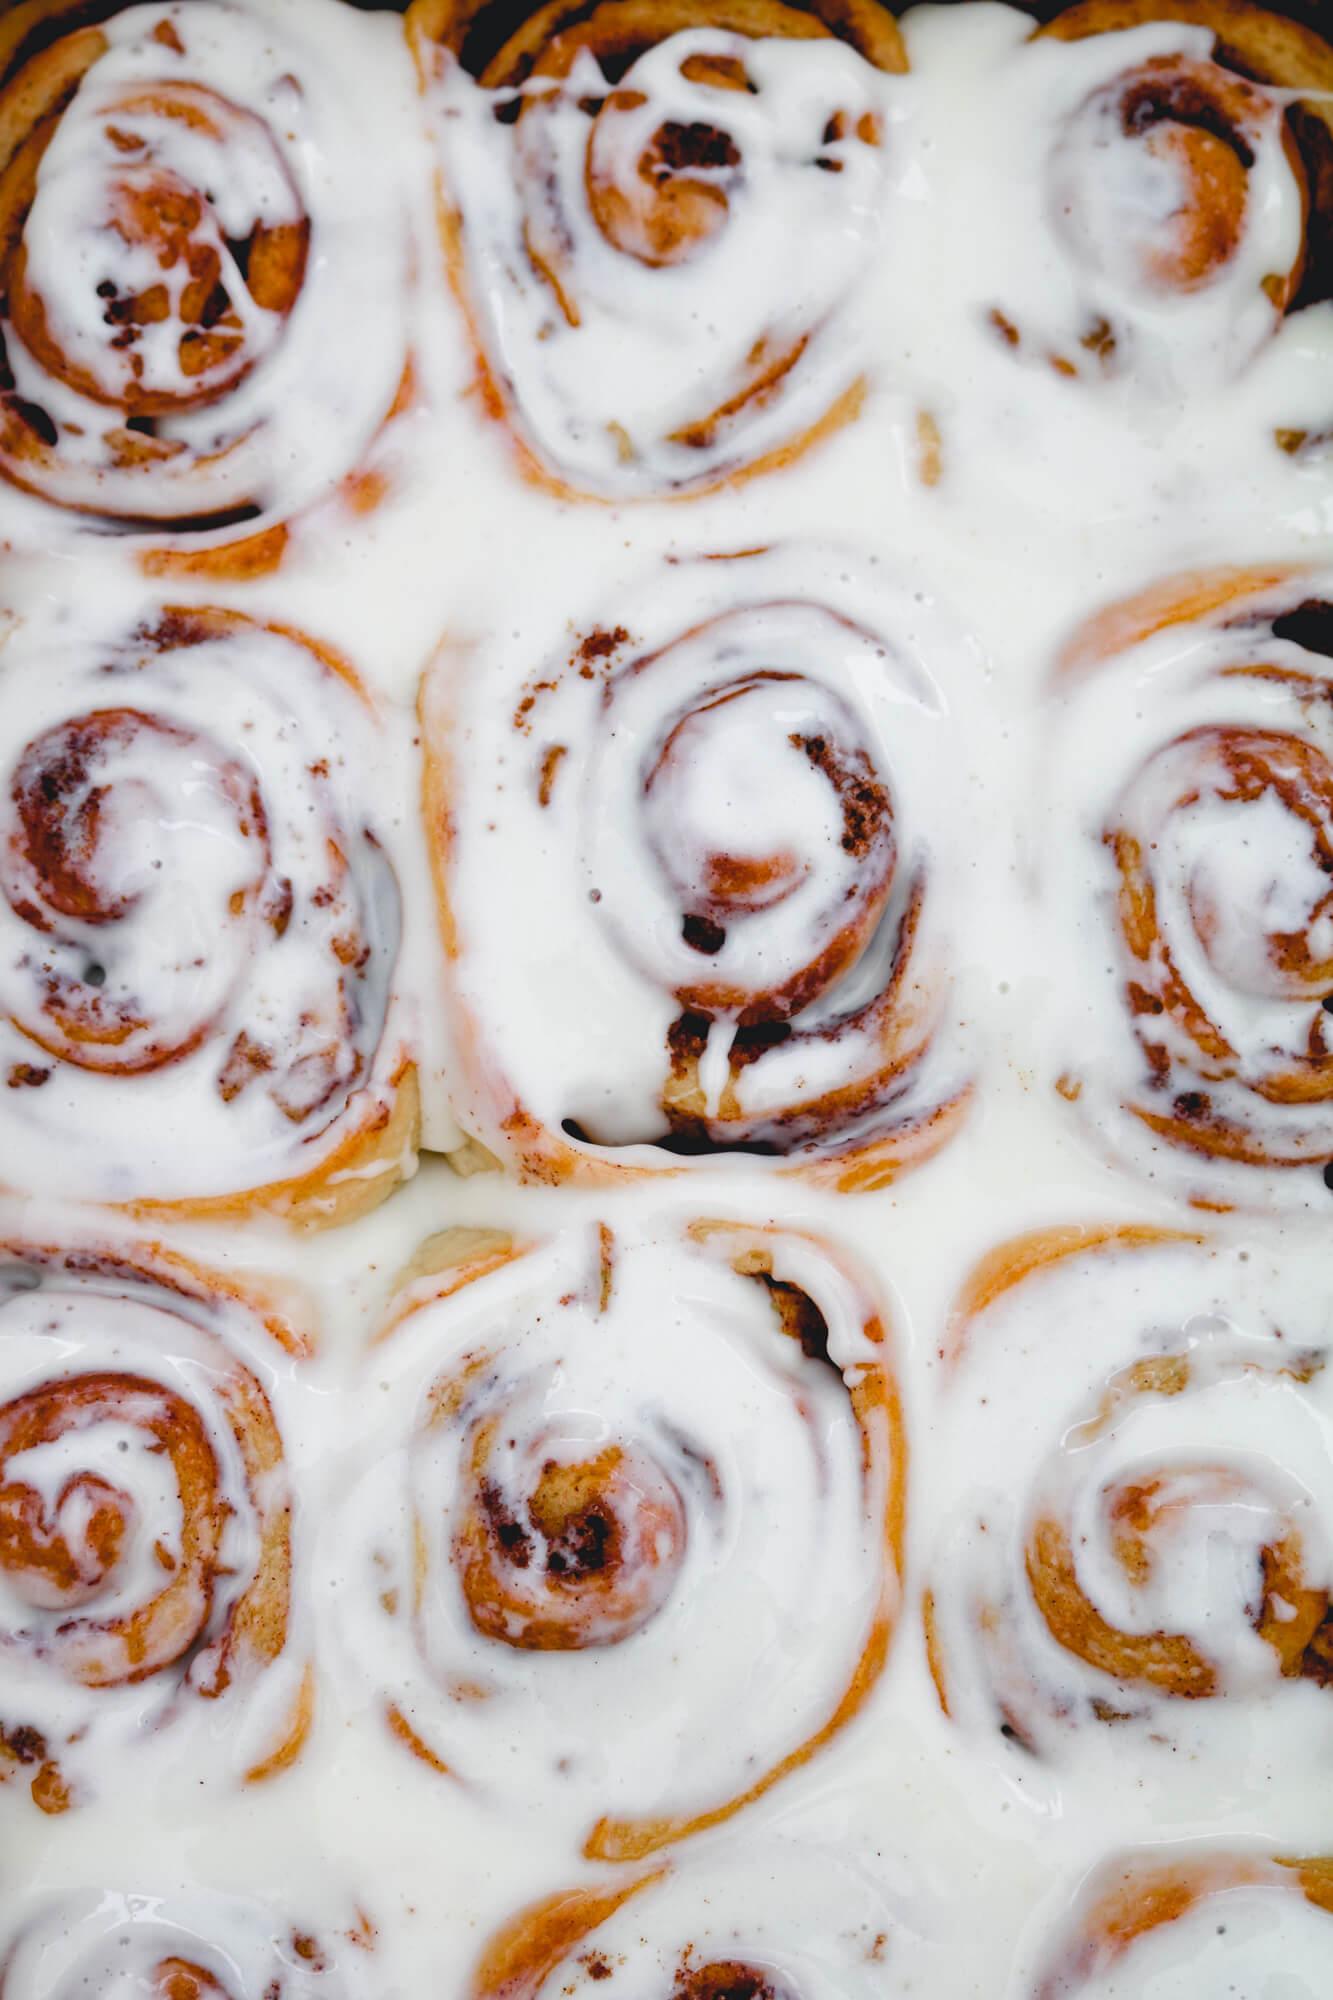 Easy Apple Cinnamon Rolls | Take Some Whisks